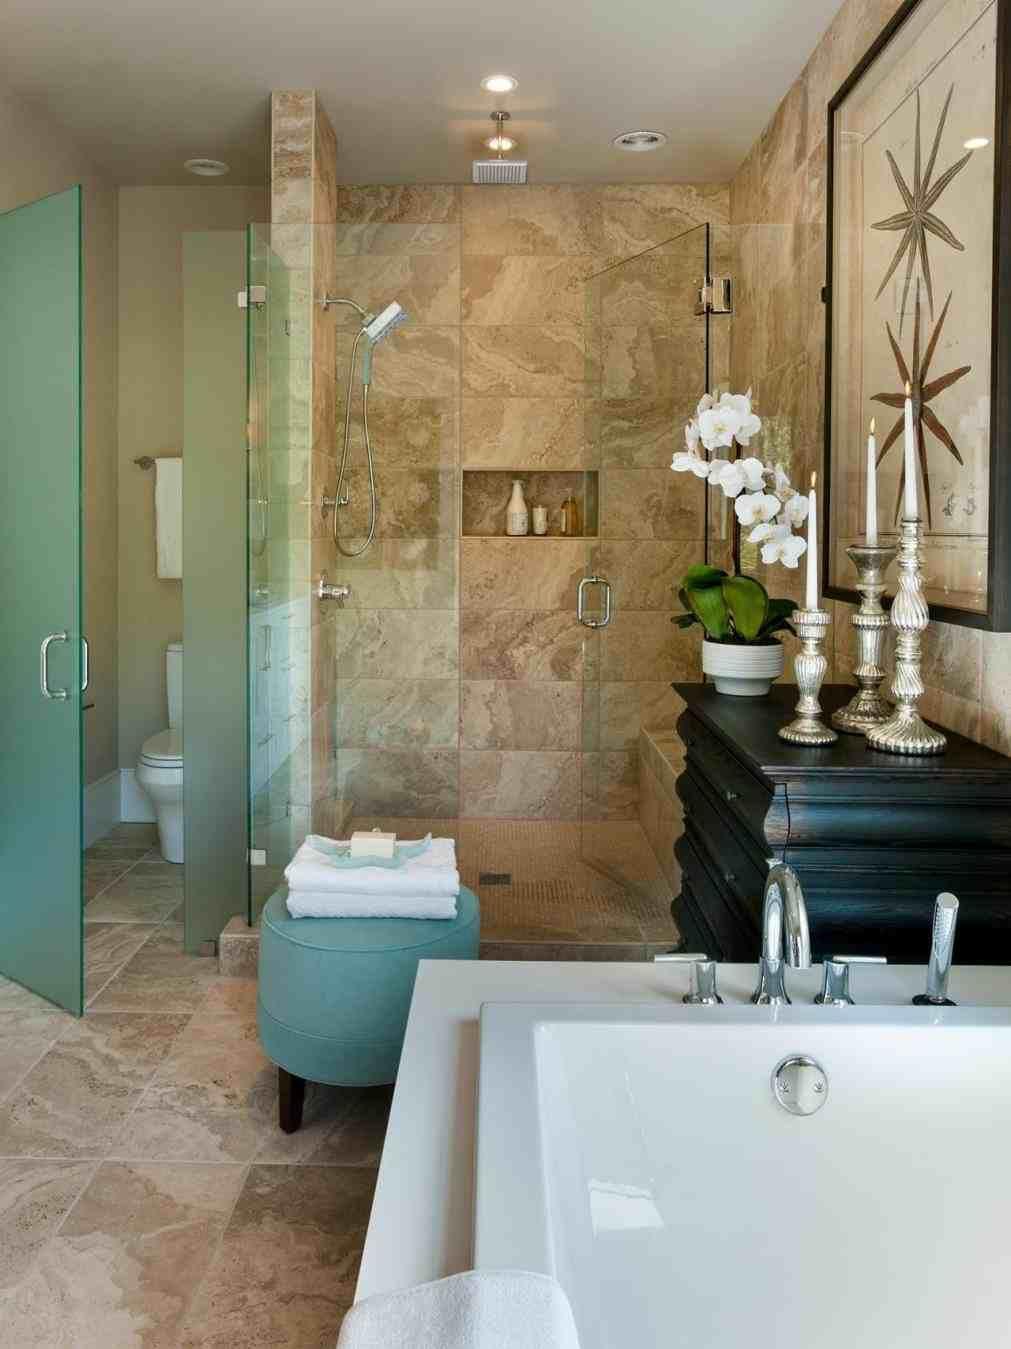 This extra large bathtub - design bathtub ideas for small bathrooms ...